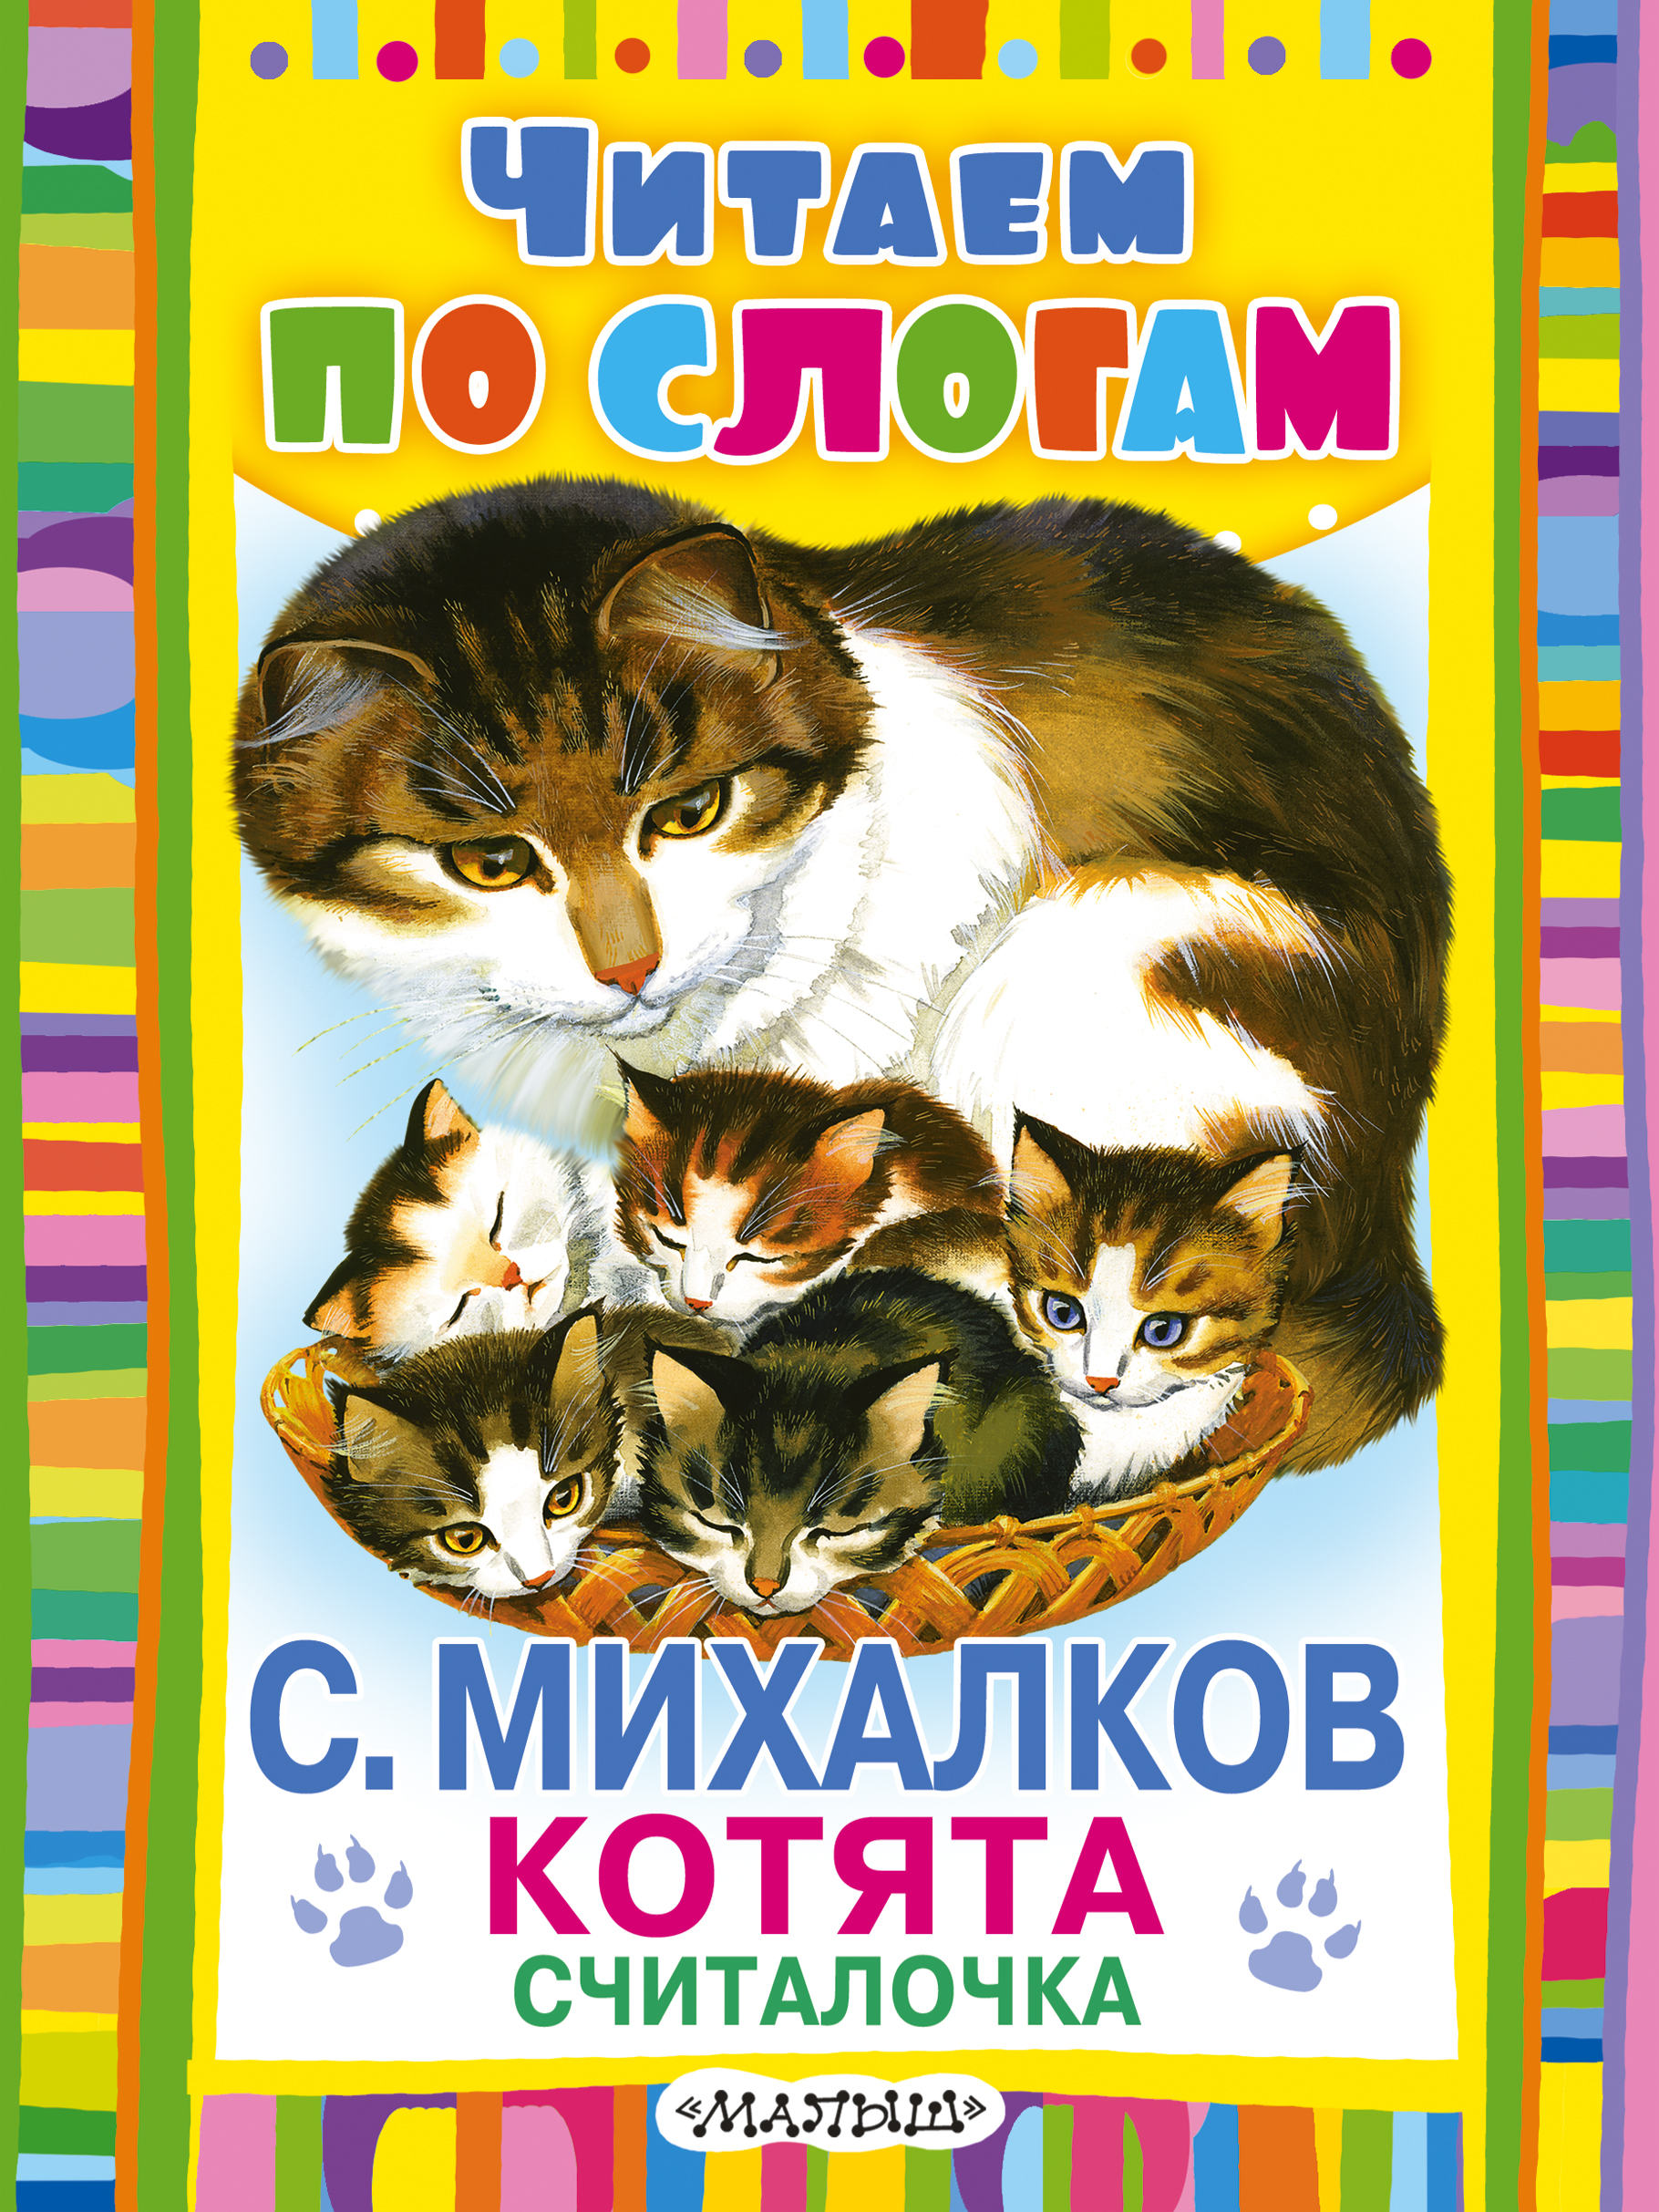 Котята (Считалочка) ( Михалков С.В.  )